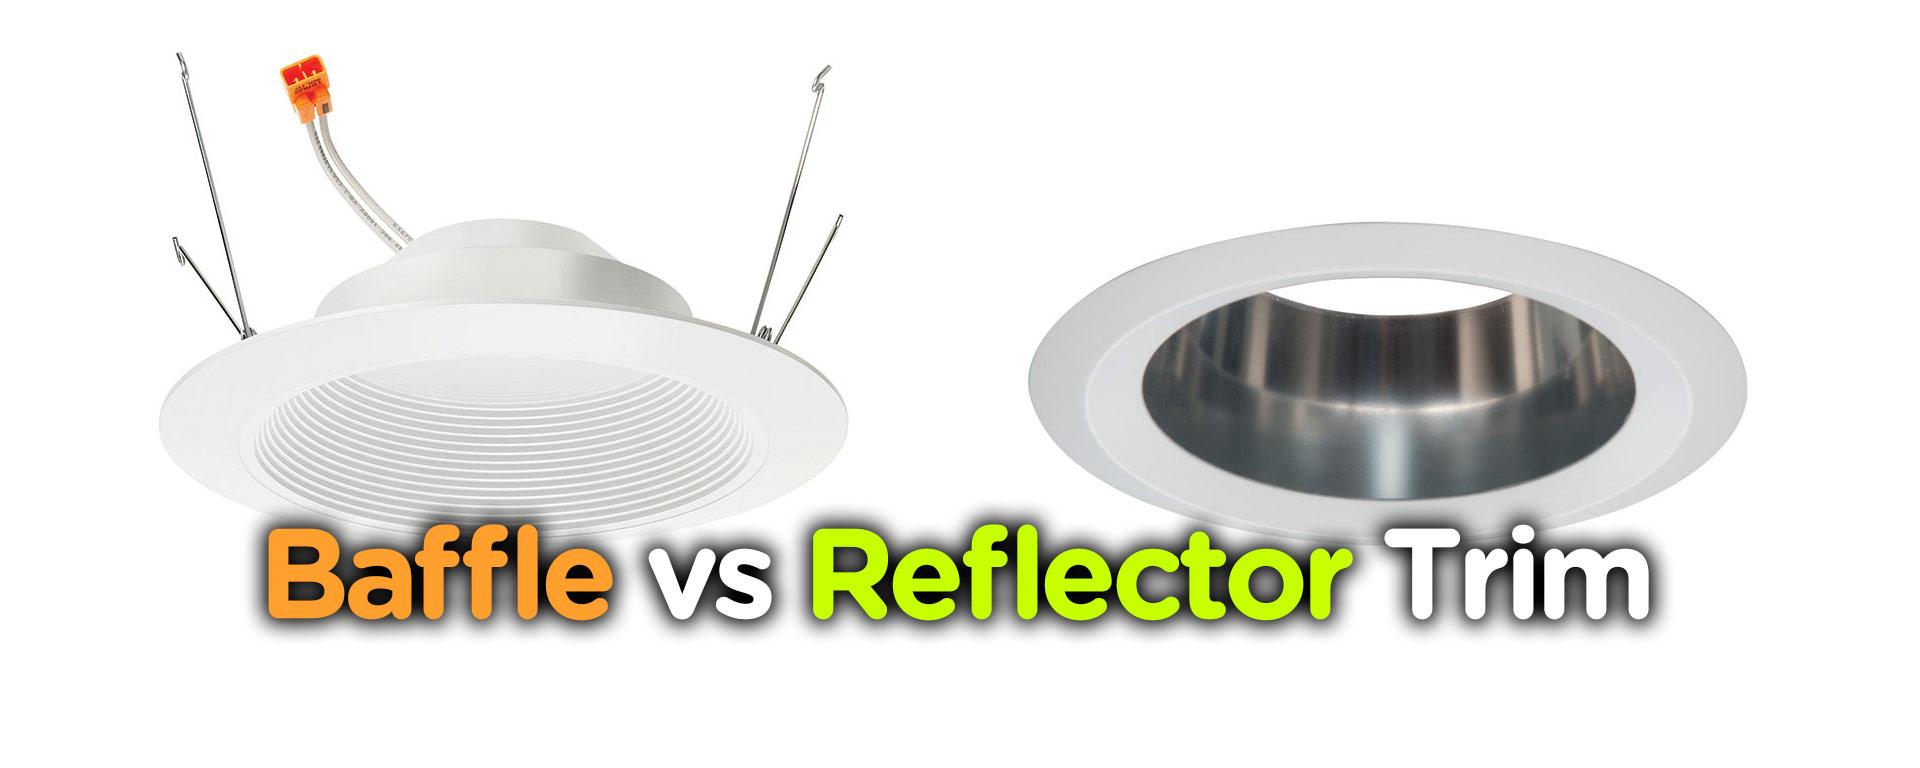 Baffle Vs Reflector Trim Of Recessed Downlight